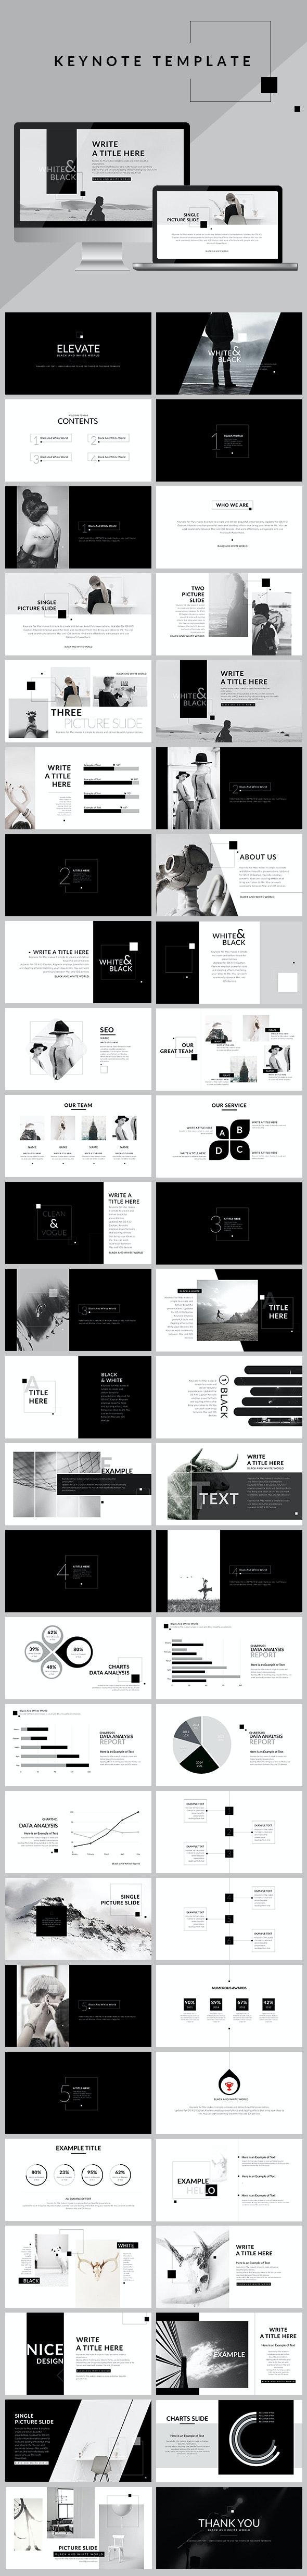 Black & White - Clean Keynote Template - Creative Keynote Templates